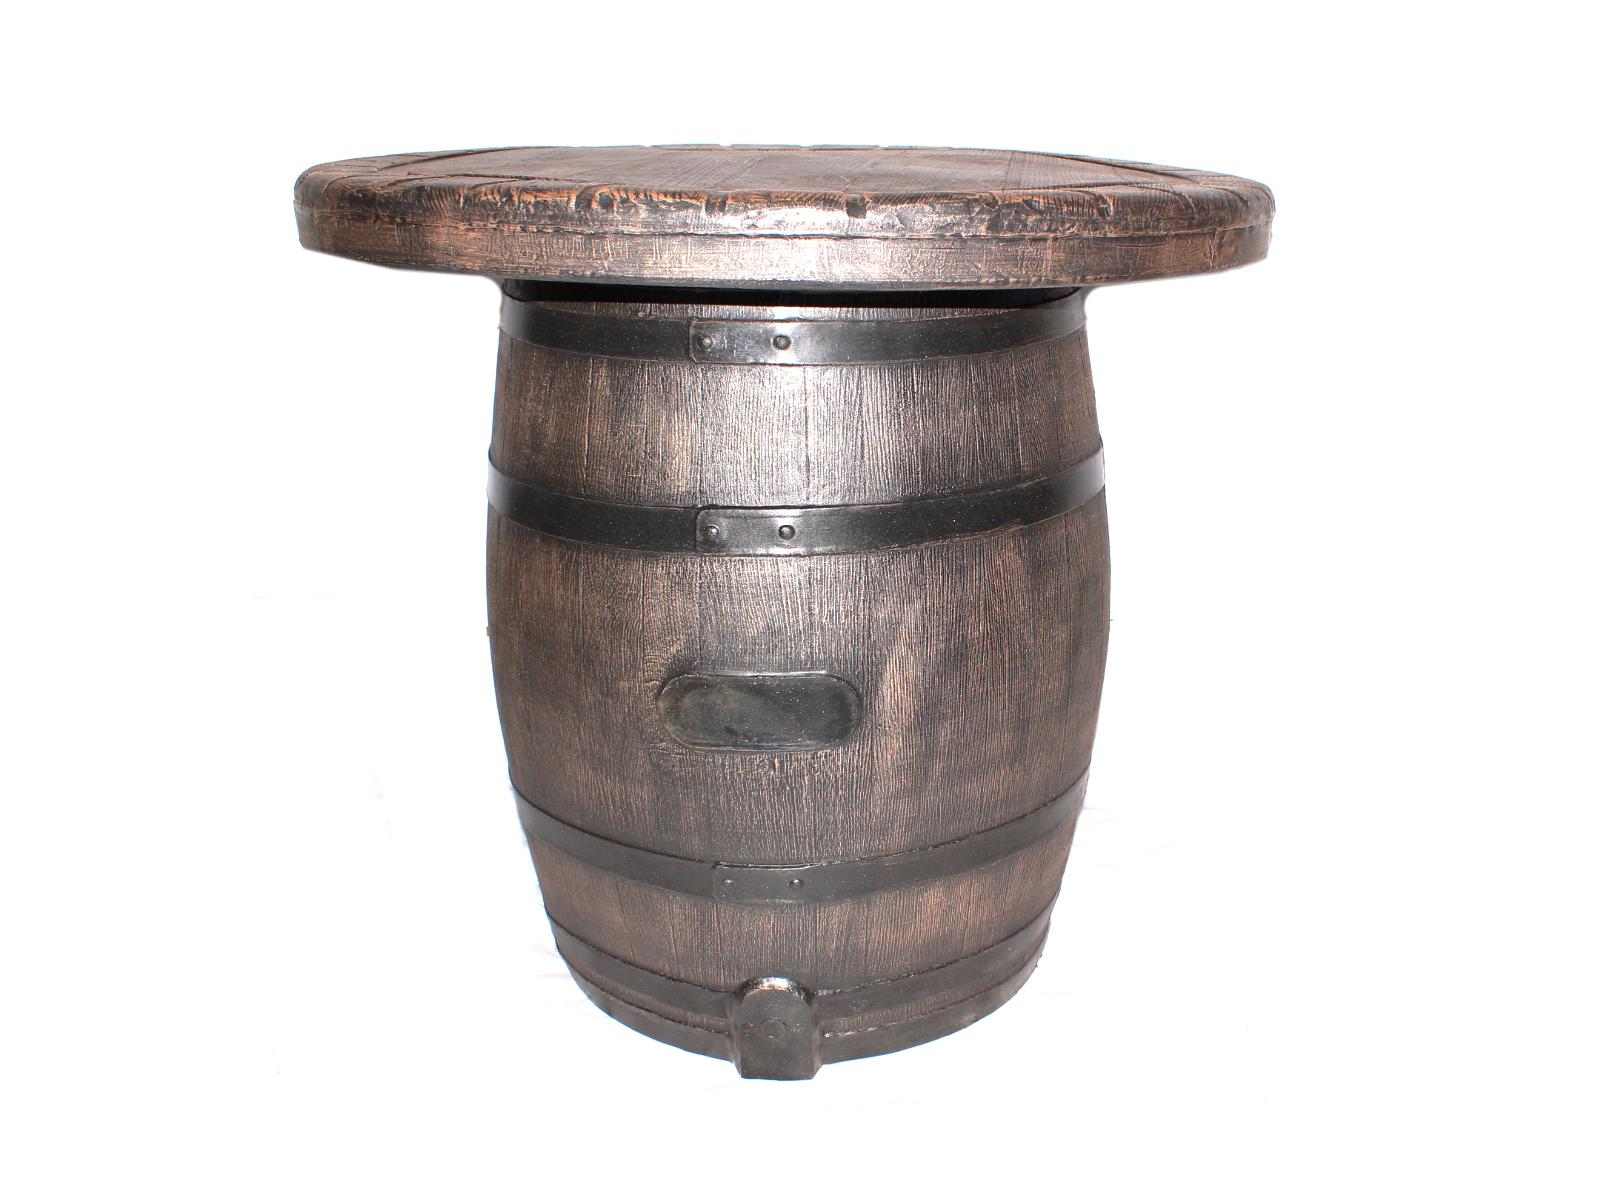 Стол БочонокСтолы и столики для сада<br><br><br>Material: Пластик<br>Height см: 90<br>Diameter см: 100